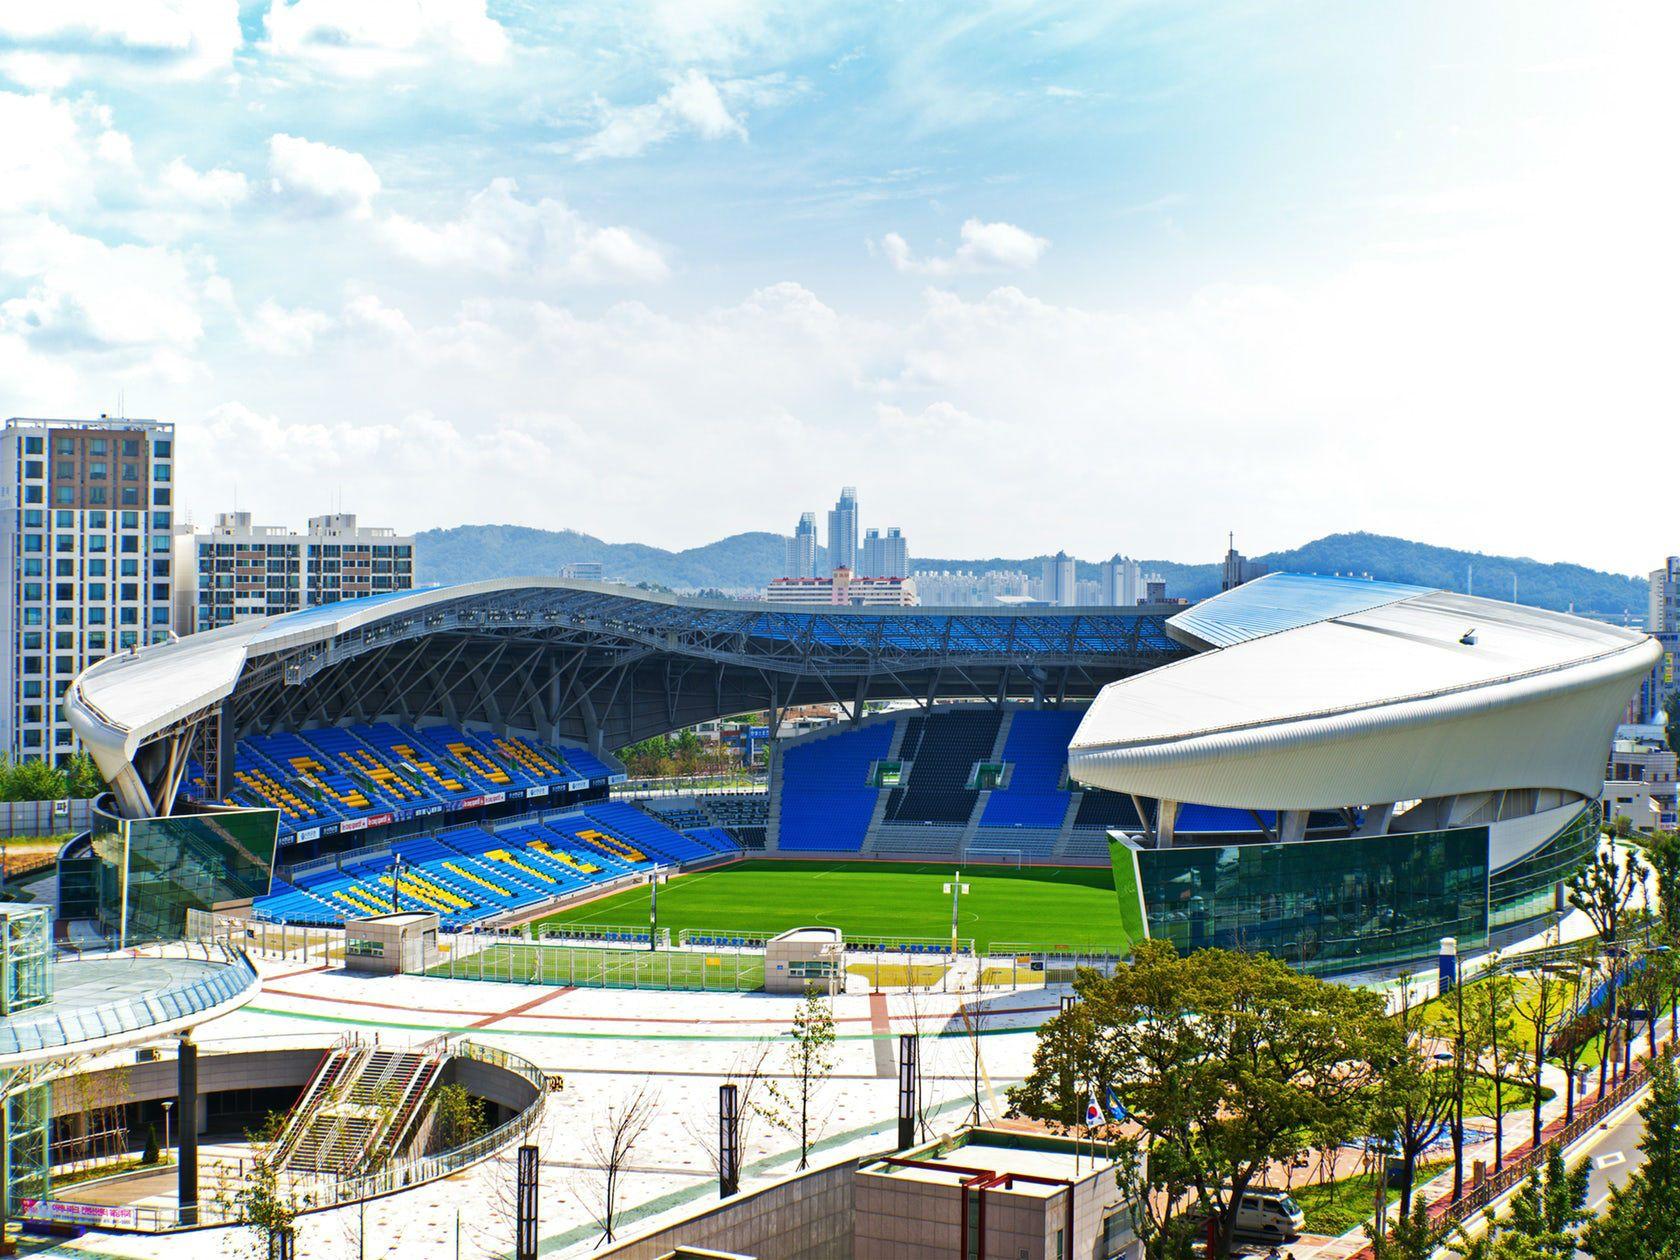 Rossetto Sedie ~ Arch2o incheon football stadium sungui arena park rossetti 03